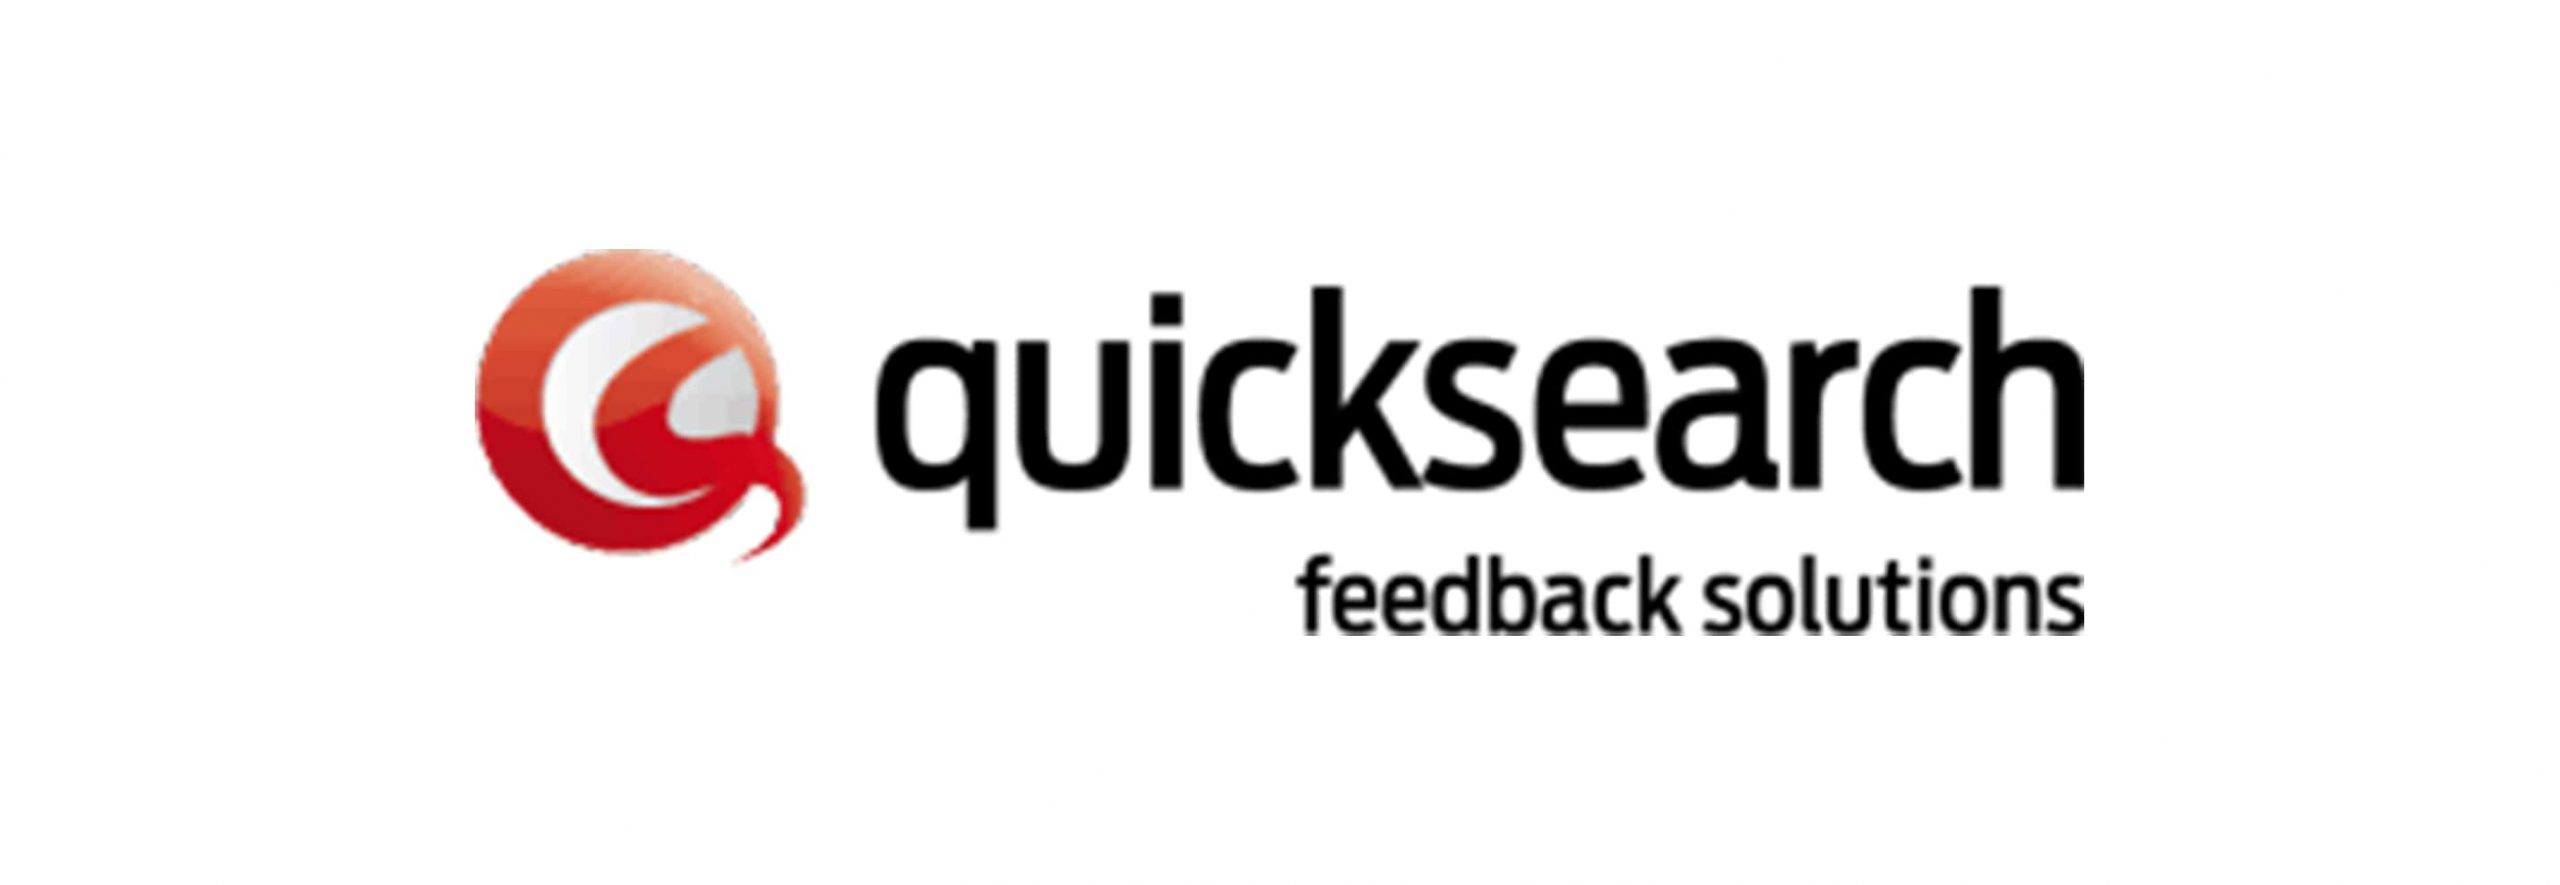 quicksearch-min